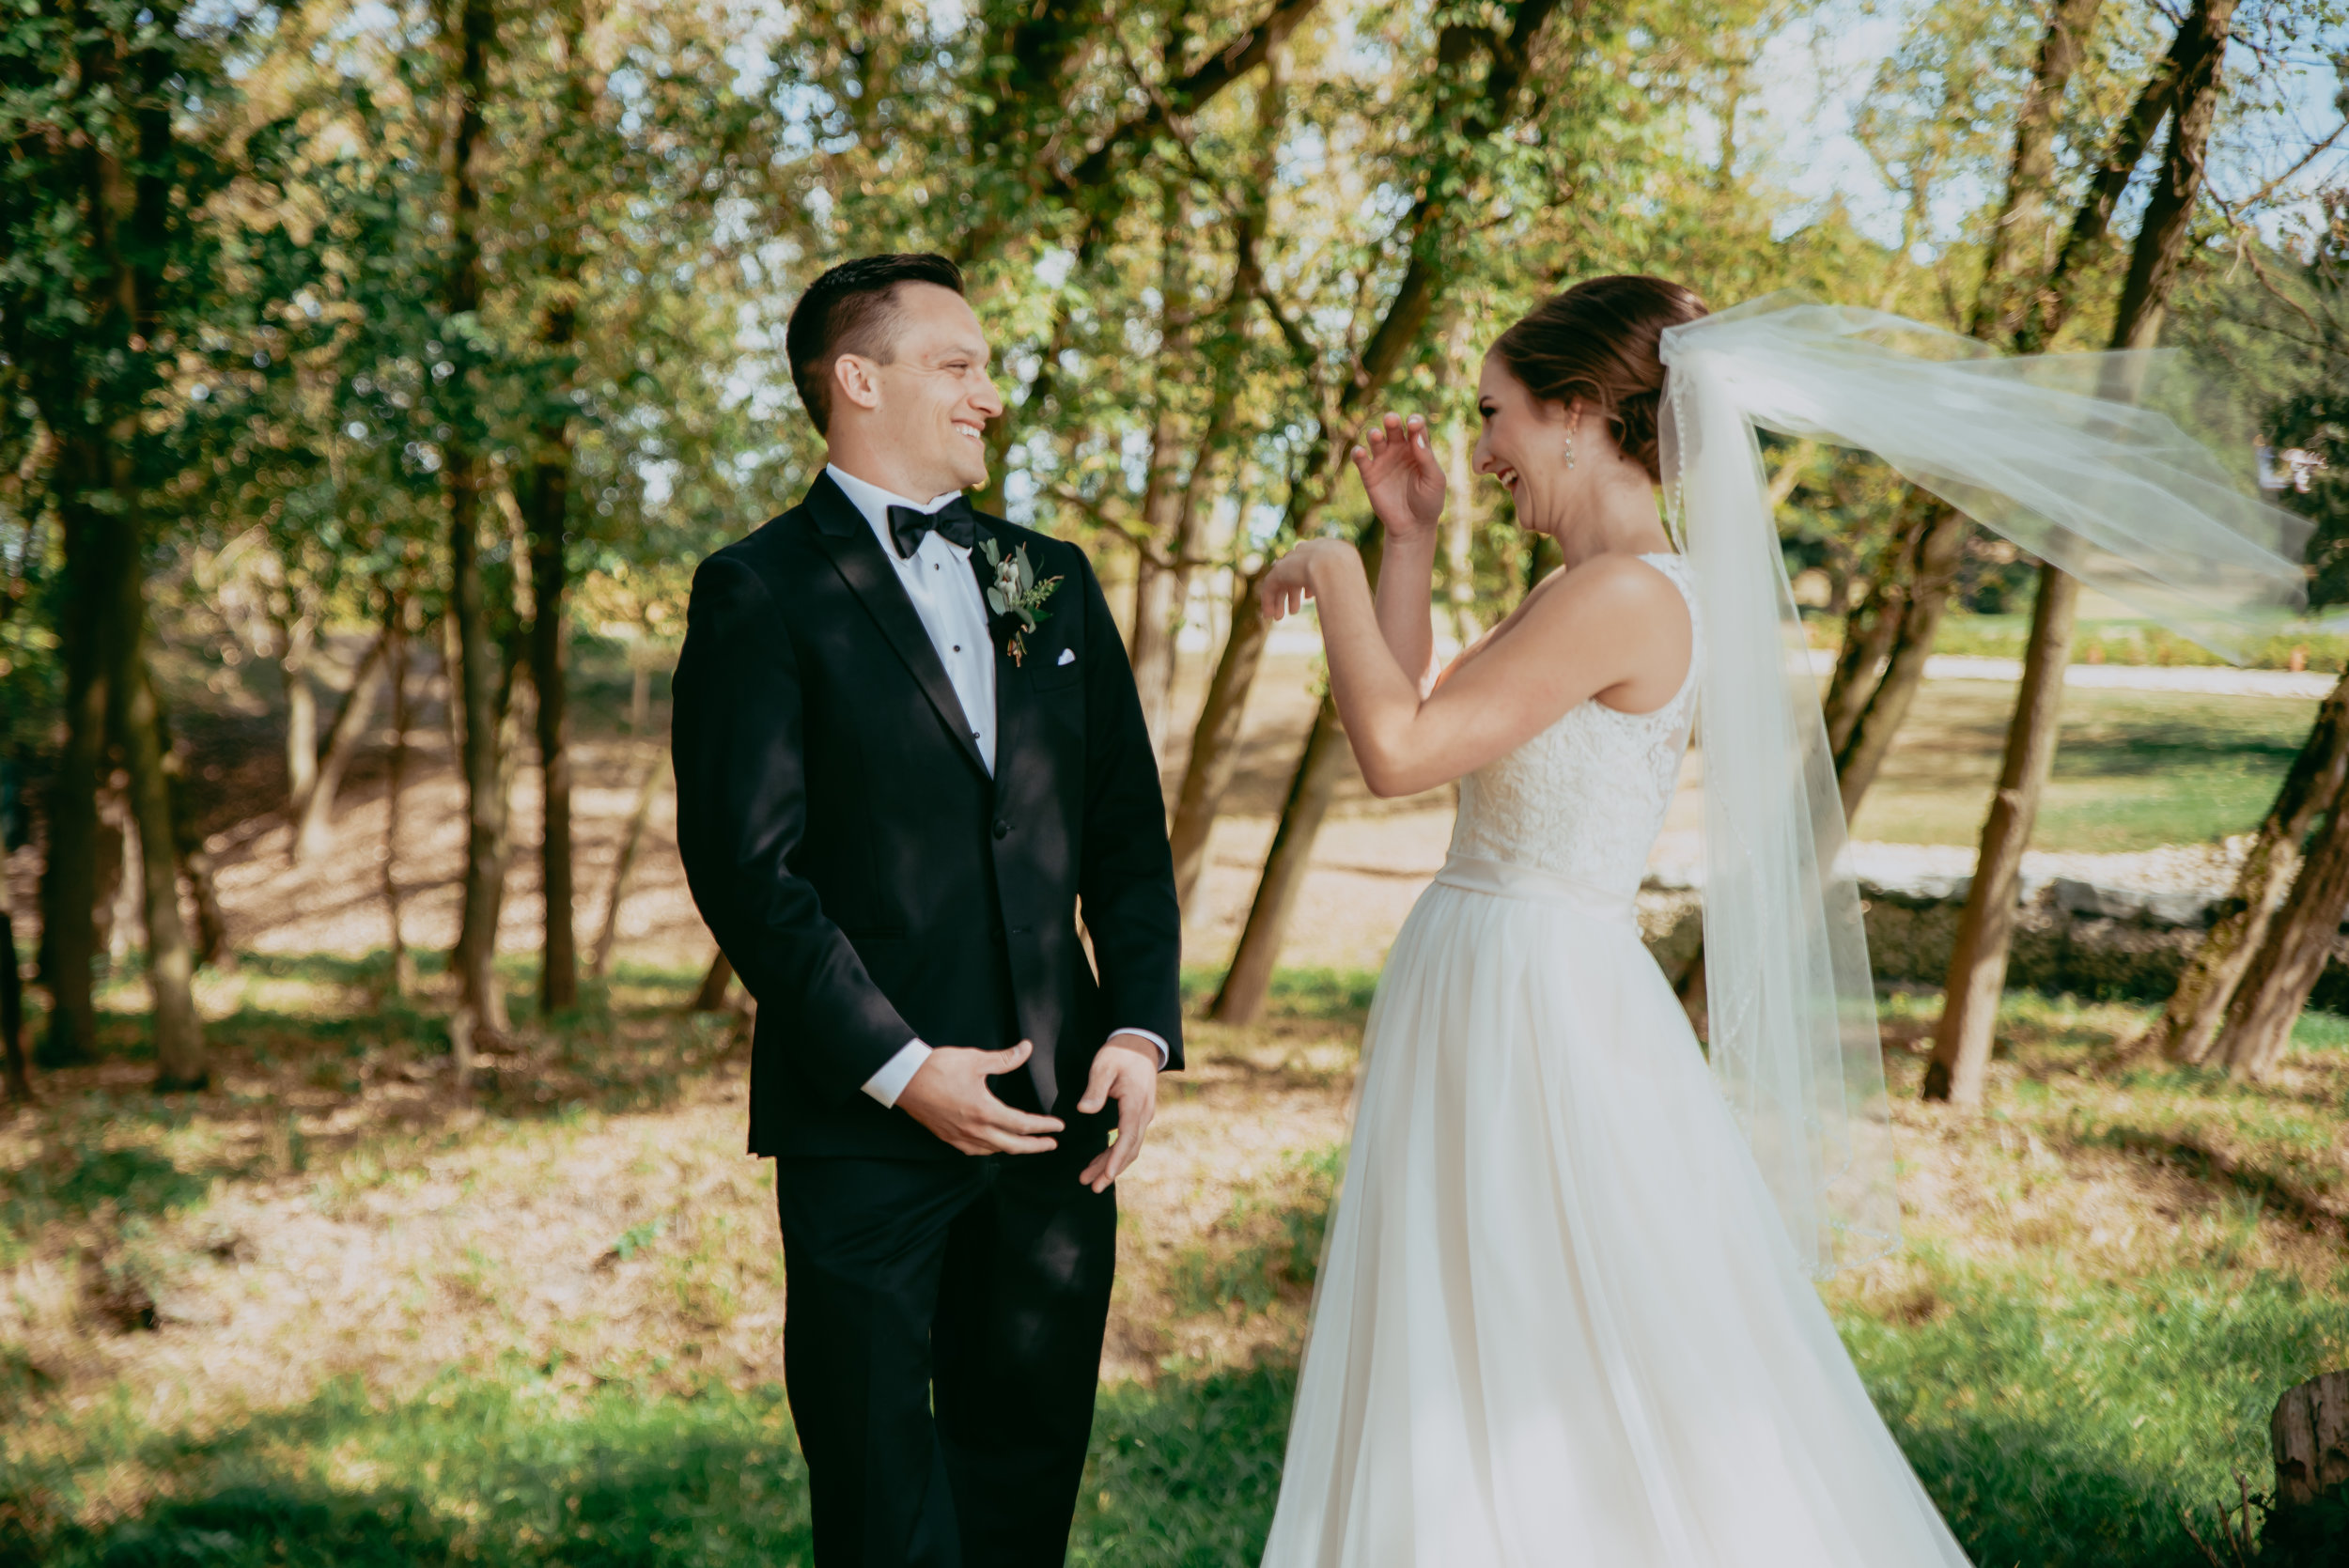 Porcelli-wedding-291.jpg